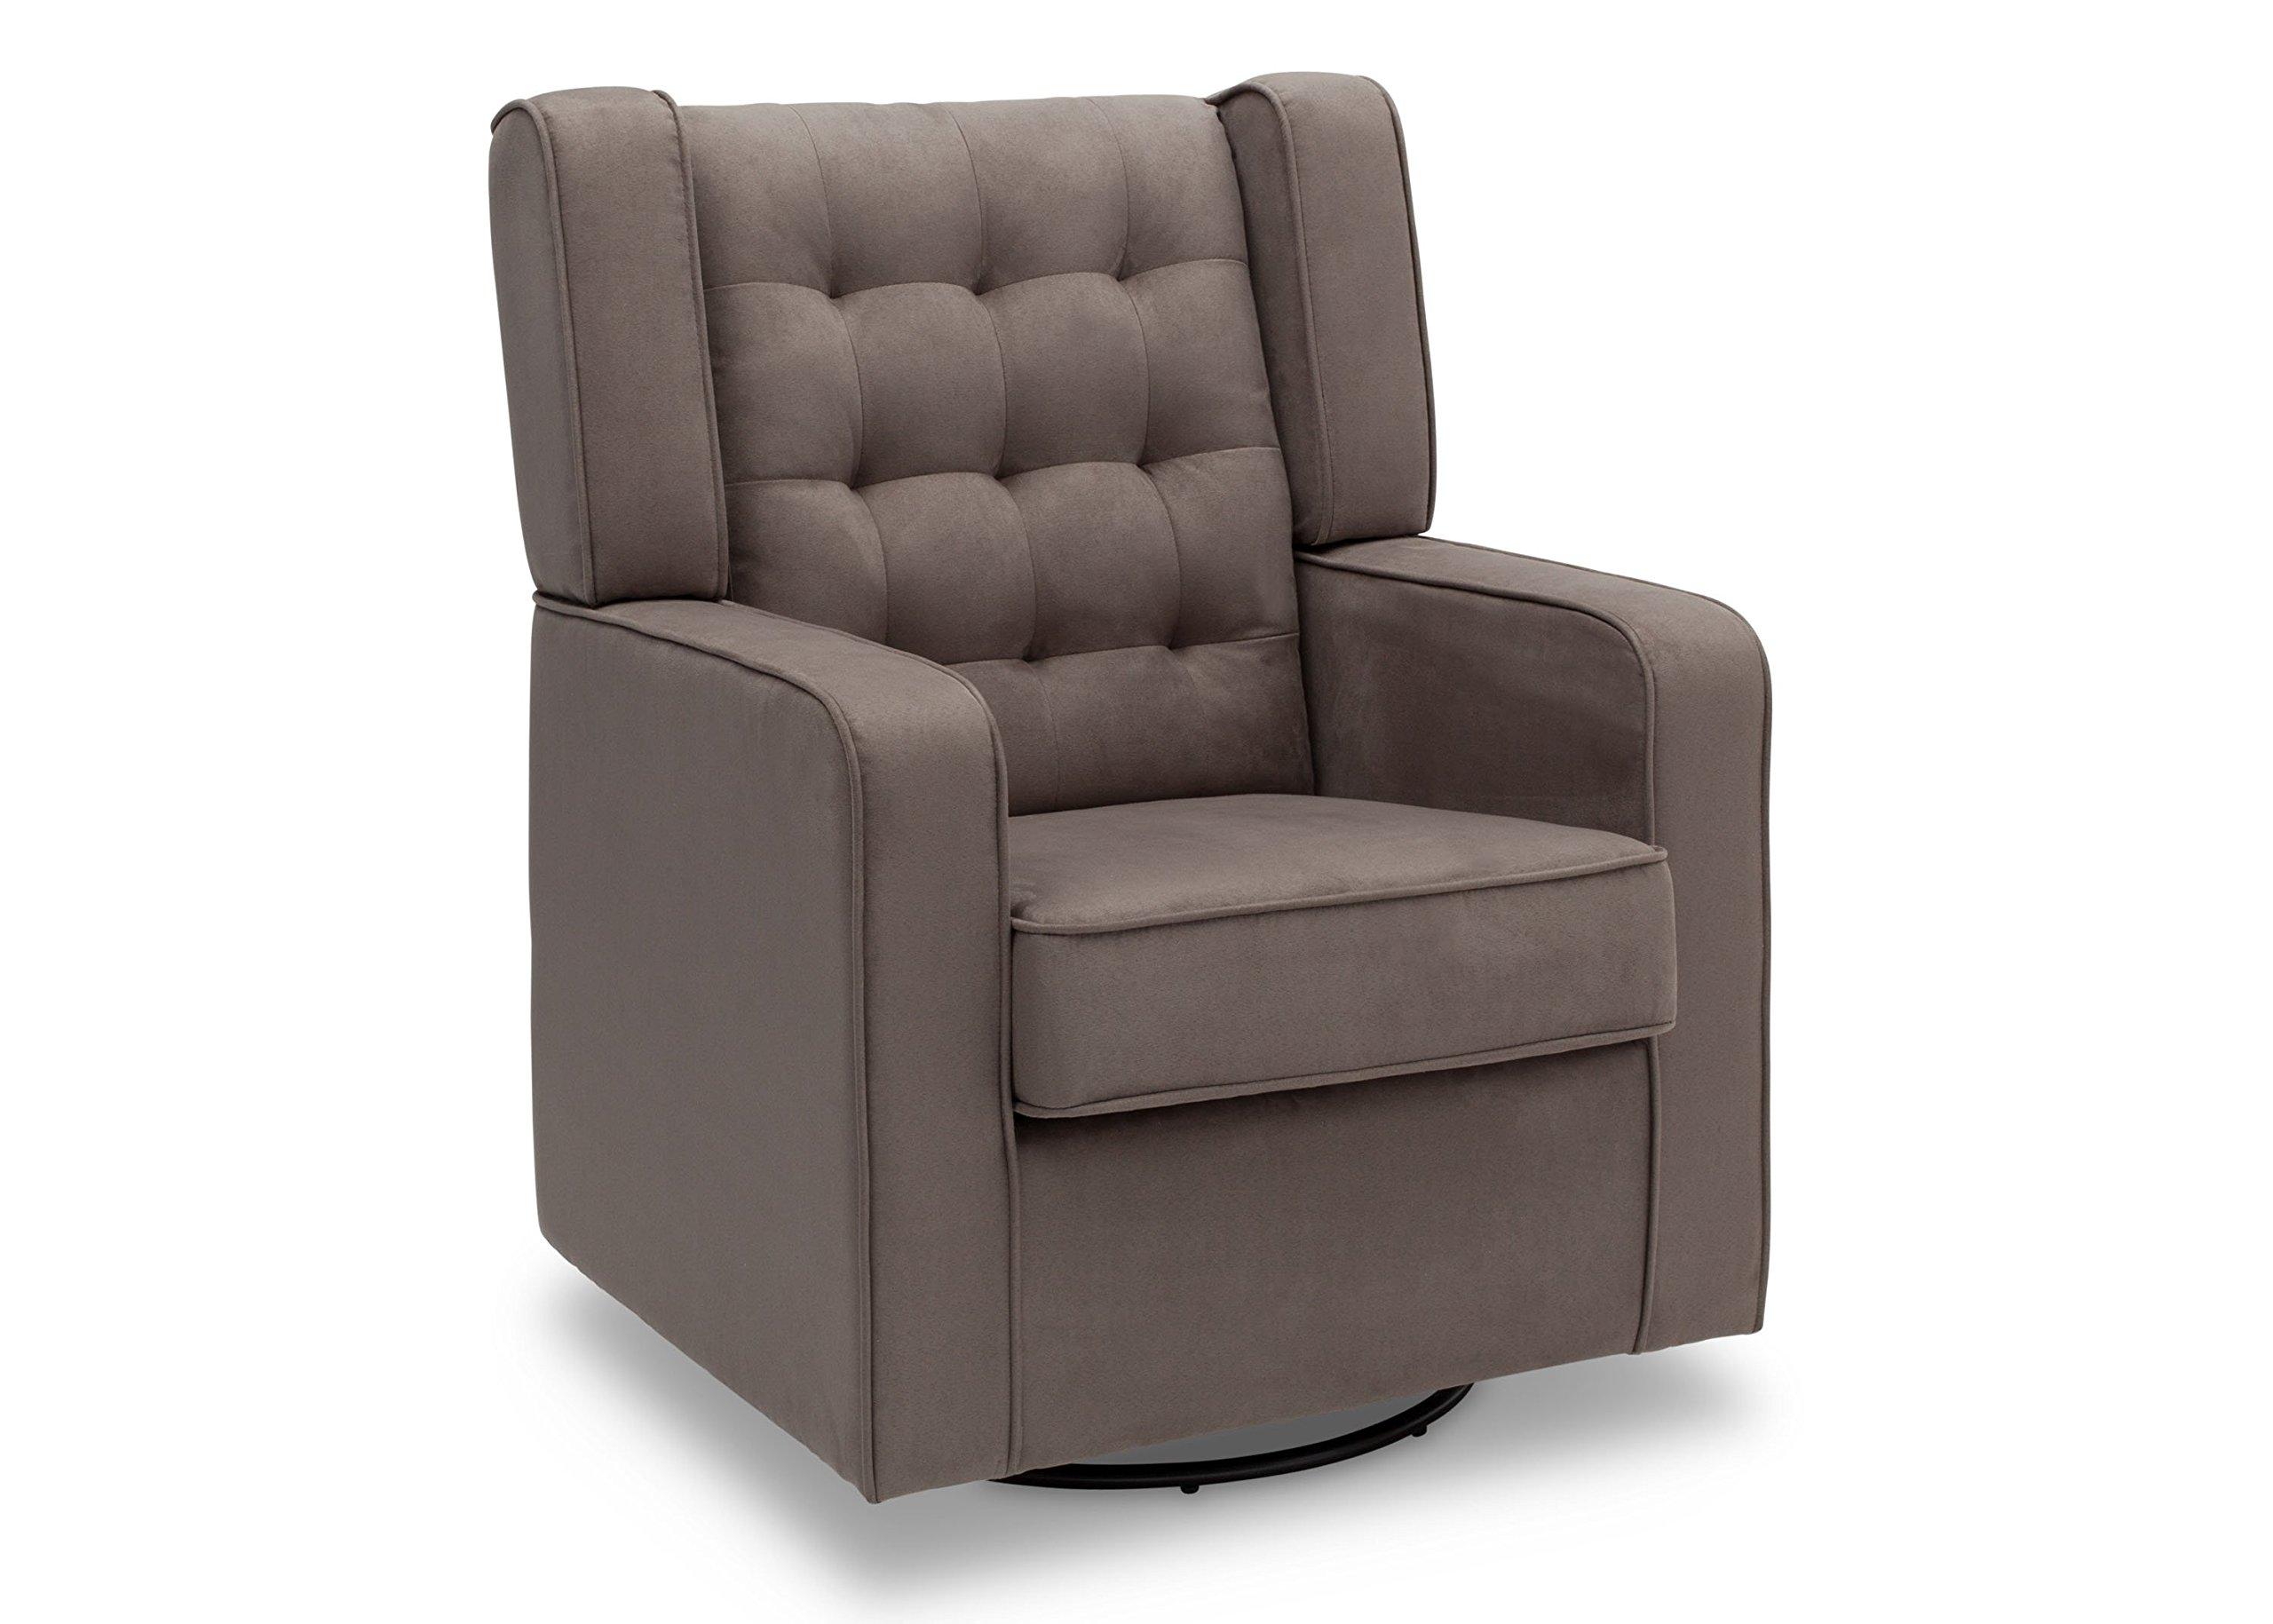 Delta Furniture Paris Upholstered Glider Swivel Rocker Chair, Graphite